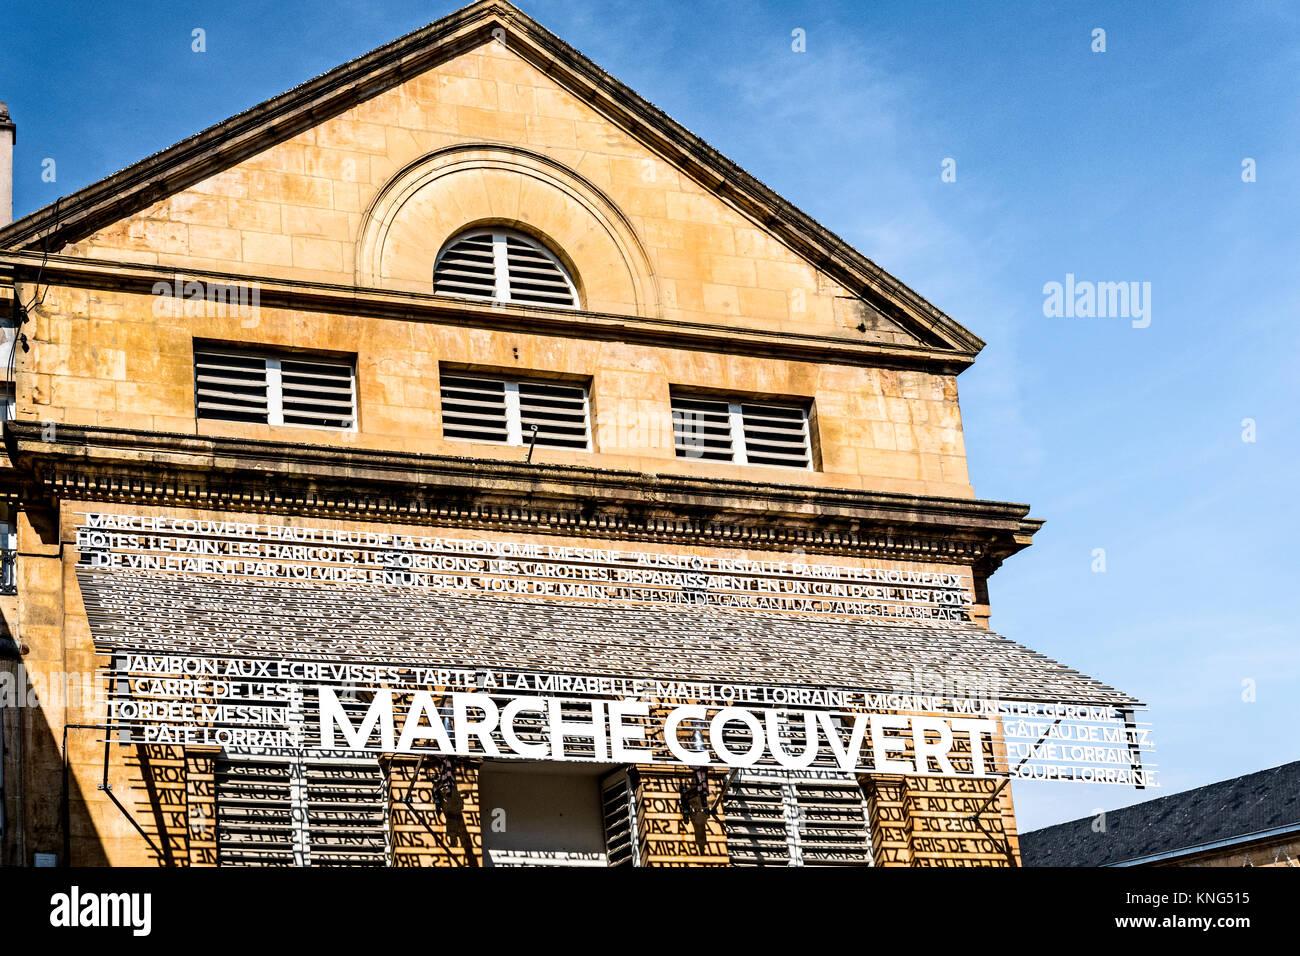 Metz (France): Covered market - Markthalle - Stock Image